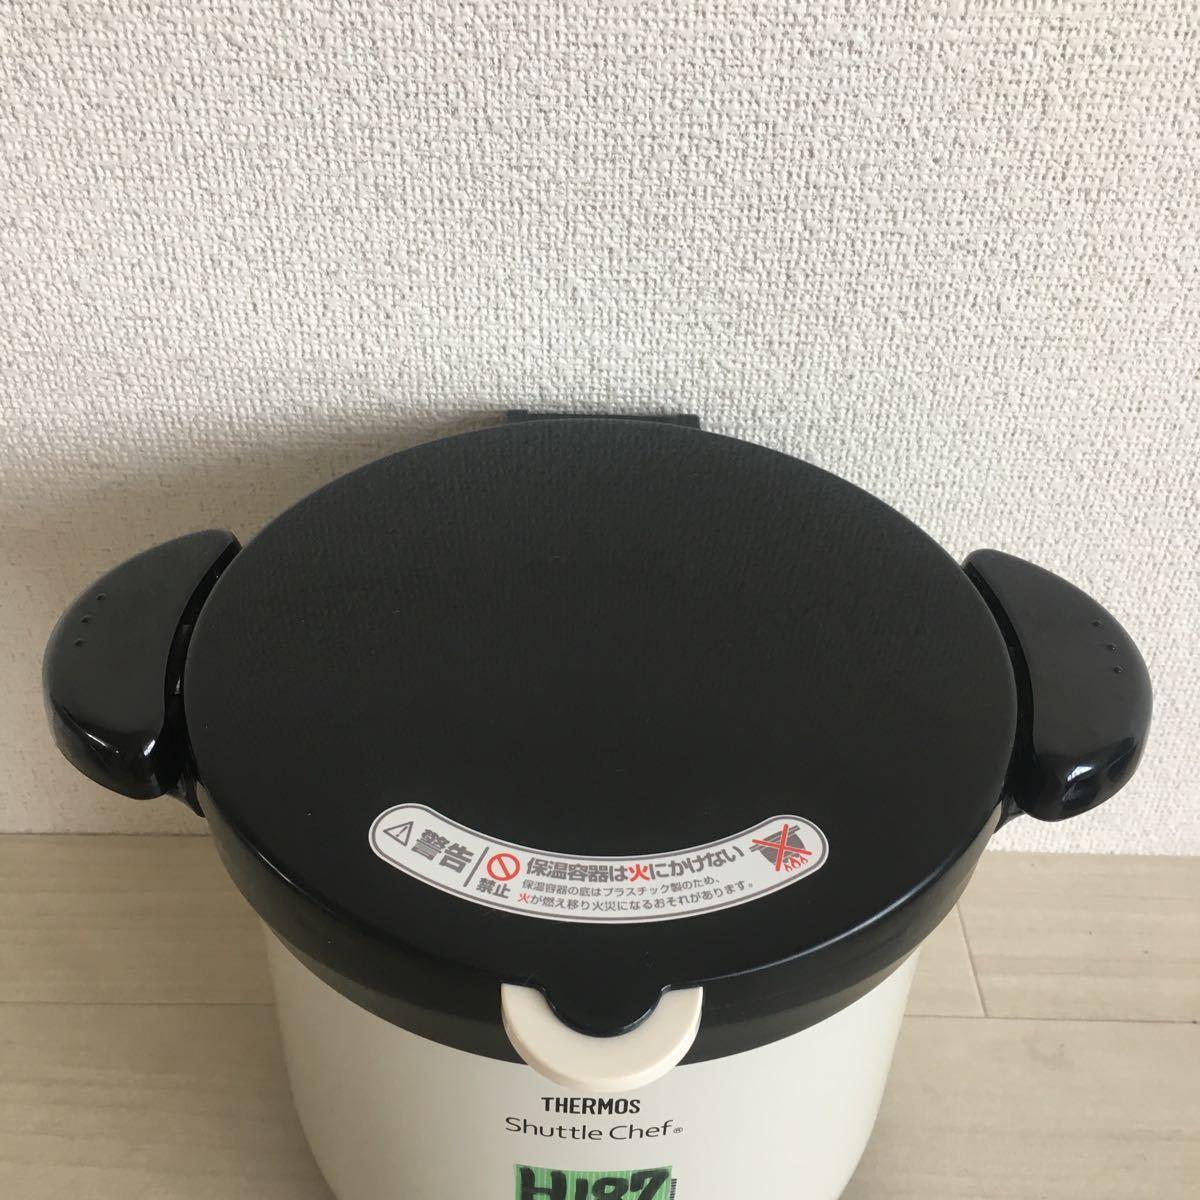 (H187)美品 THERMOS/サーモス 真空保温調理器 シャトルシェフ KBH-4501( OWH)_画像2